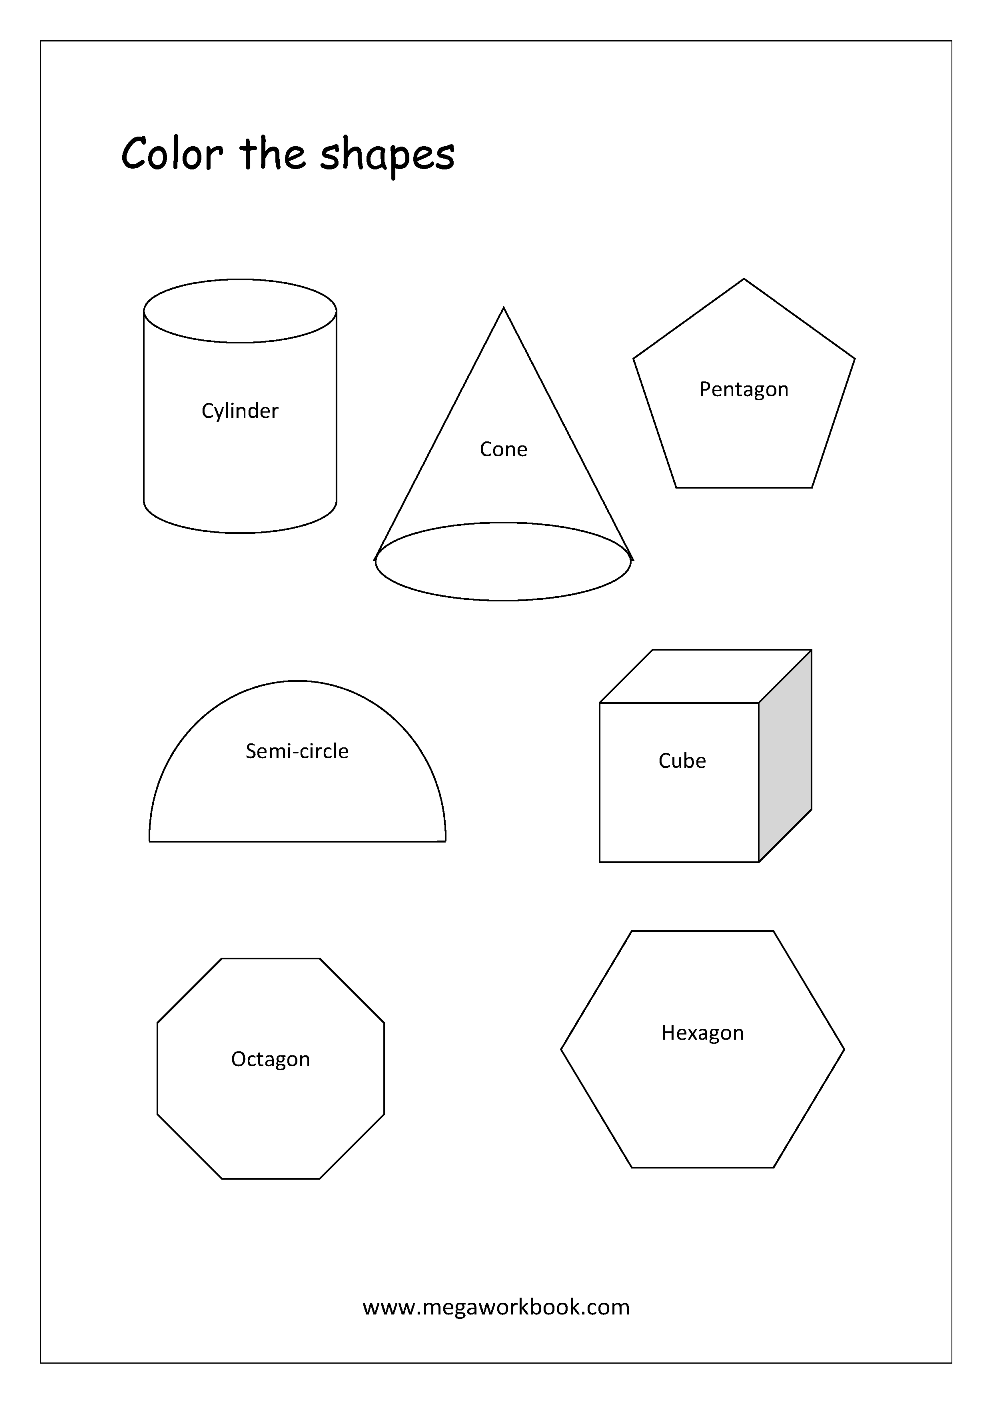 Strong Em Advanced Shapes Coloring Worksheets Cylinder Cone Pentagon Hexagon C Shape Worksheets For Preschool Shape Tracing Worksheets Shapes Preschool [ 1403 x 992 Pixel ]